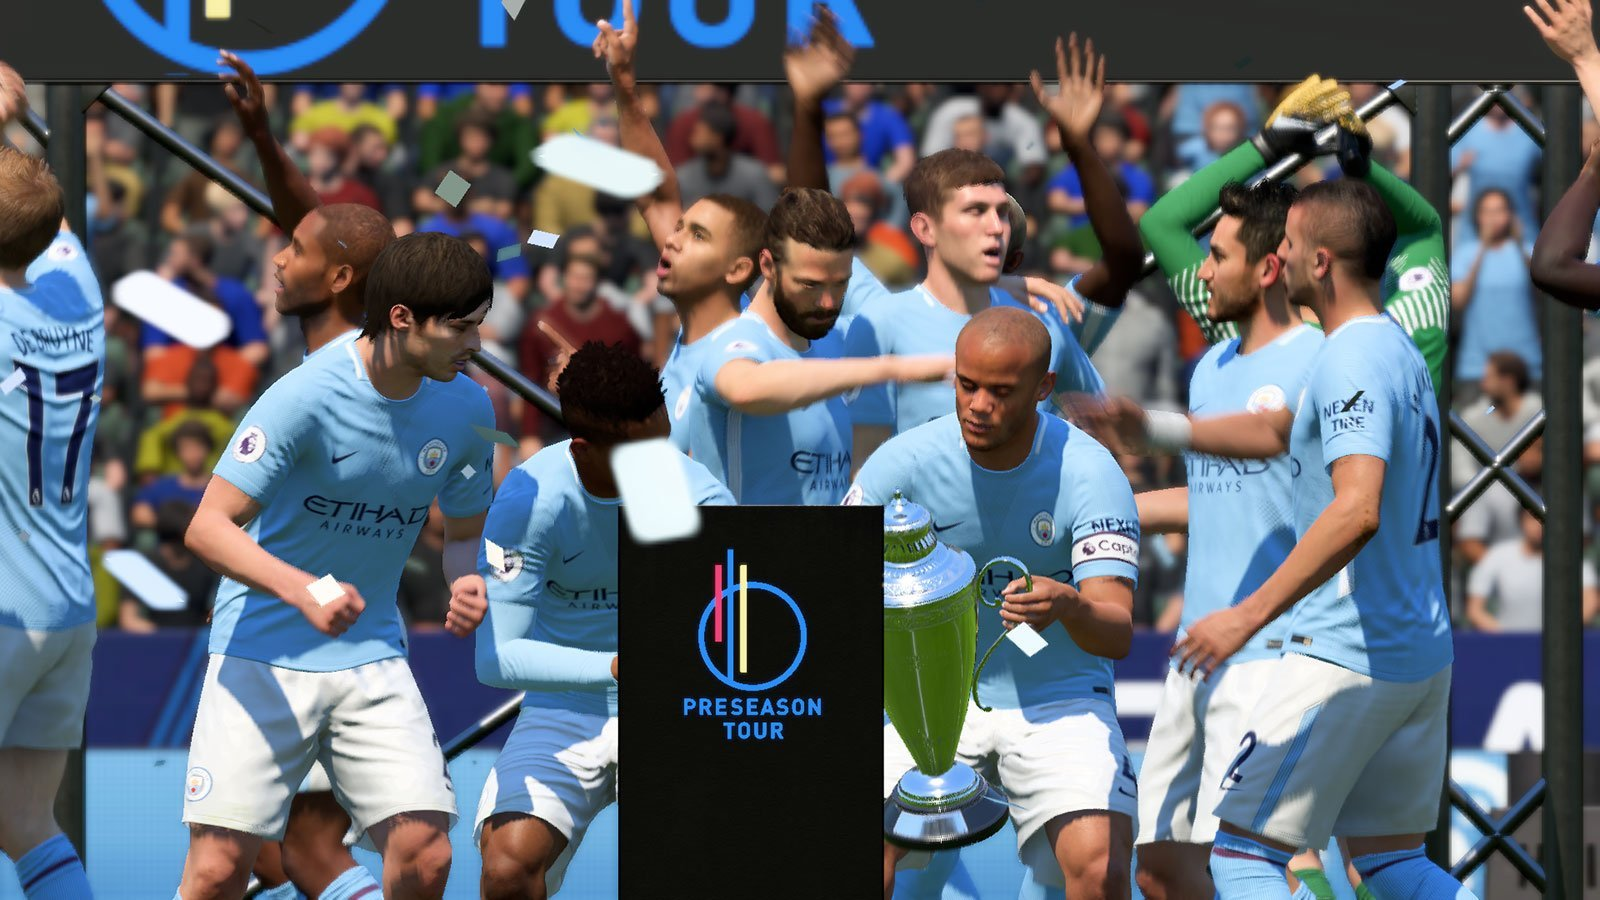 FIFA 18 Screenshot 2017.09.30 02.44.03